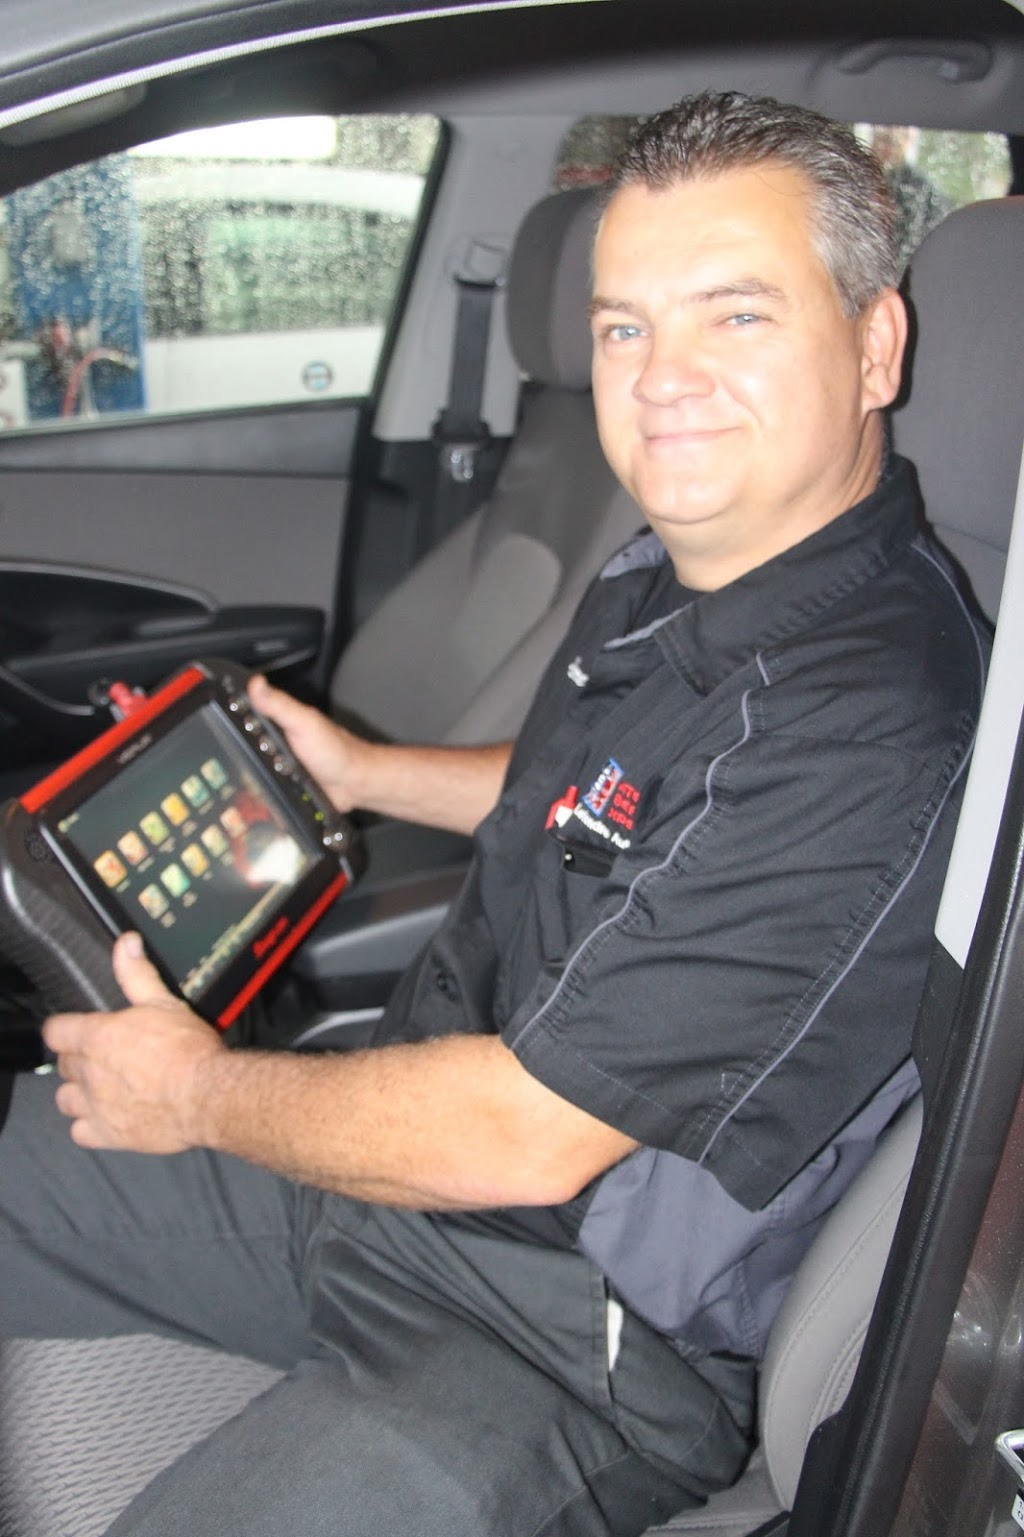 Garage Letendre Auto   car repair   539 Rue Fréchette, Granby, QC J2G 8H1, Canada   4503787464 OR +1 450-378-7464